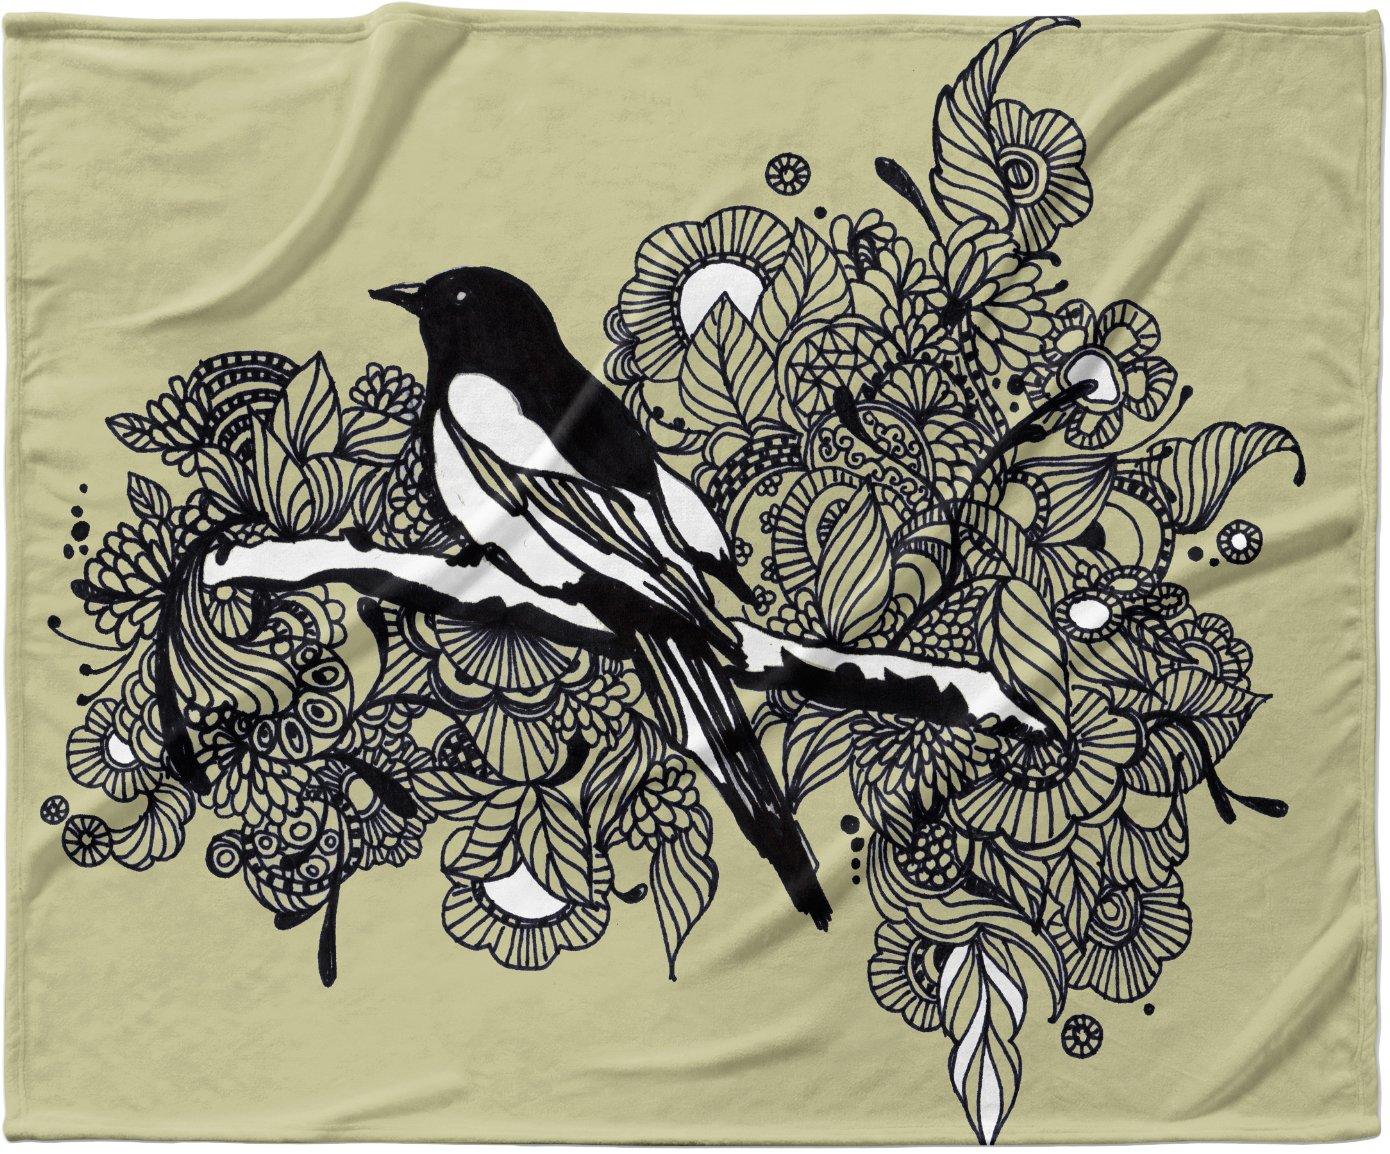 40 x 30 Kess InHouse Sonal Nathwani Magpie Tan Bird Fleece Throw Blanket